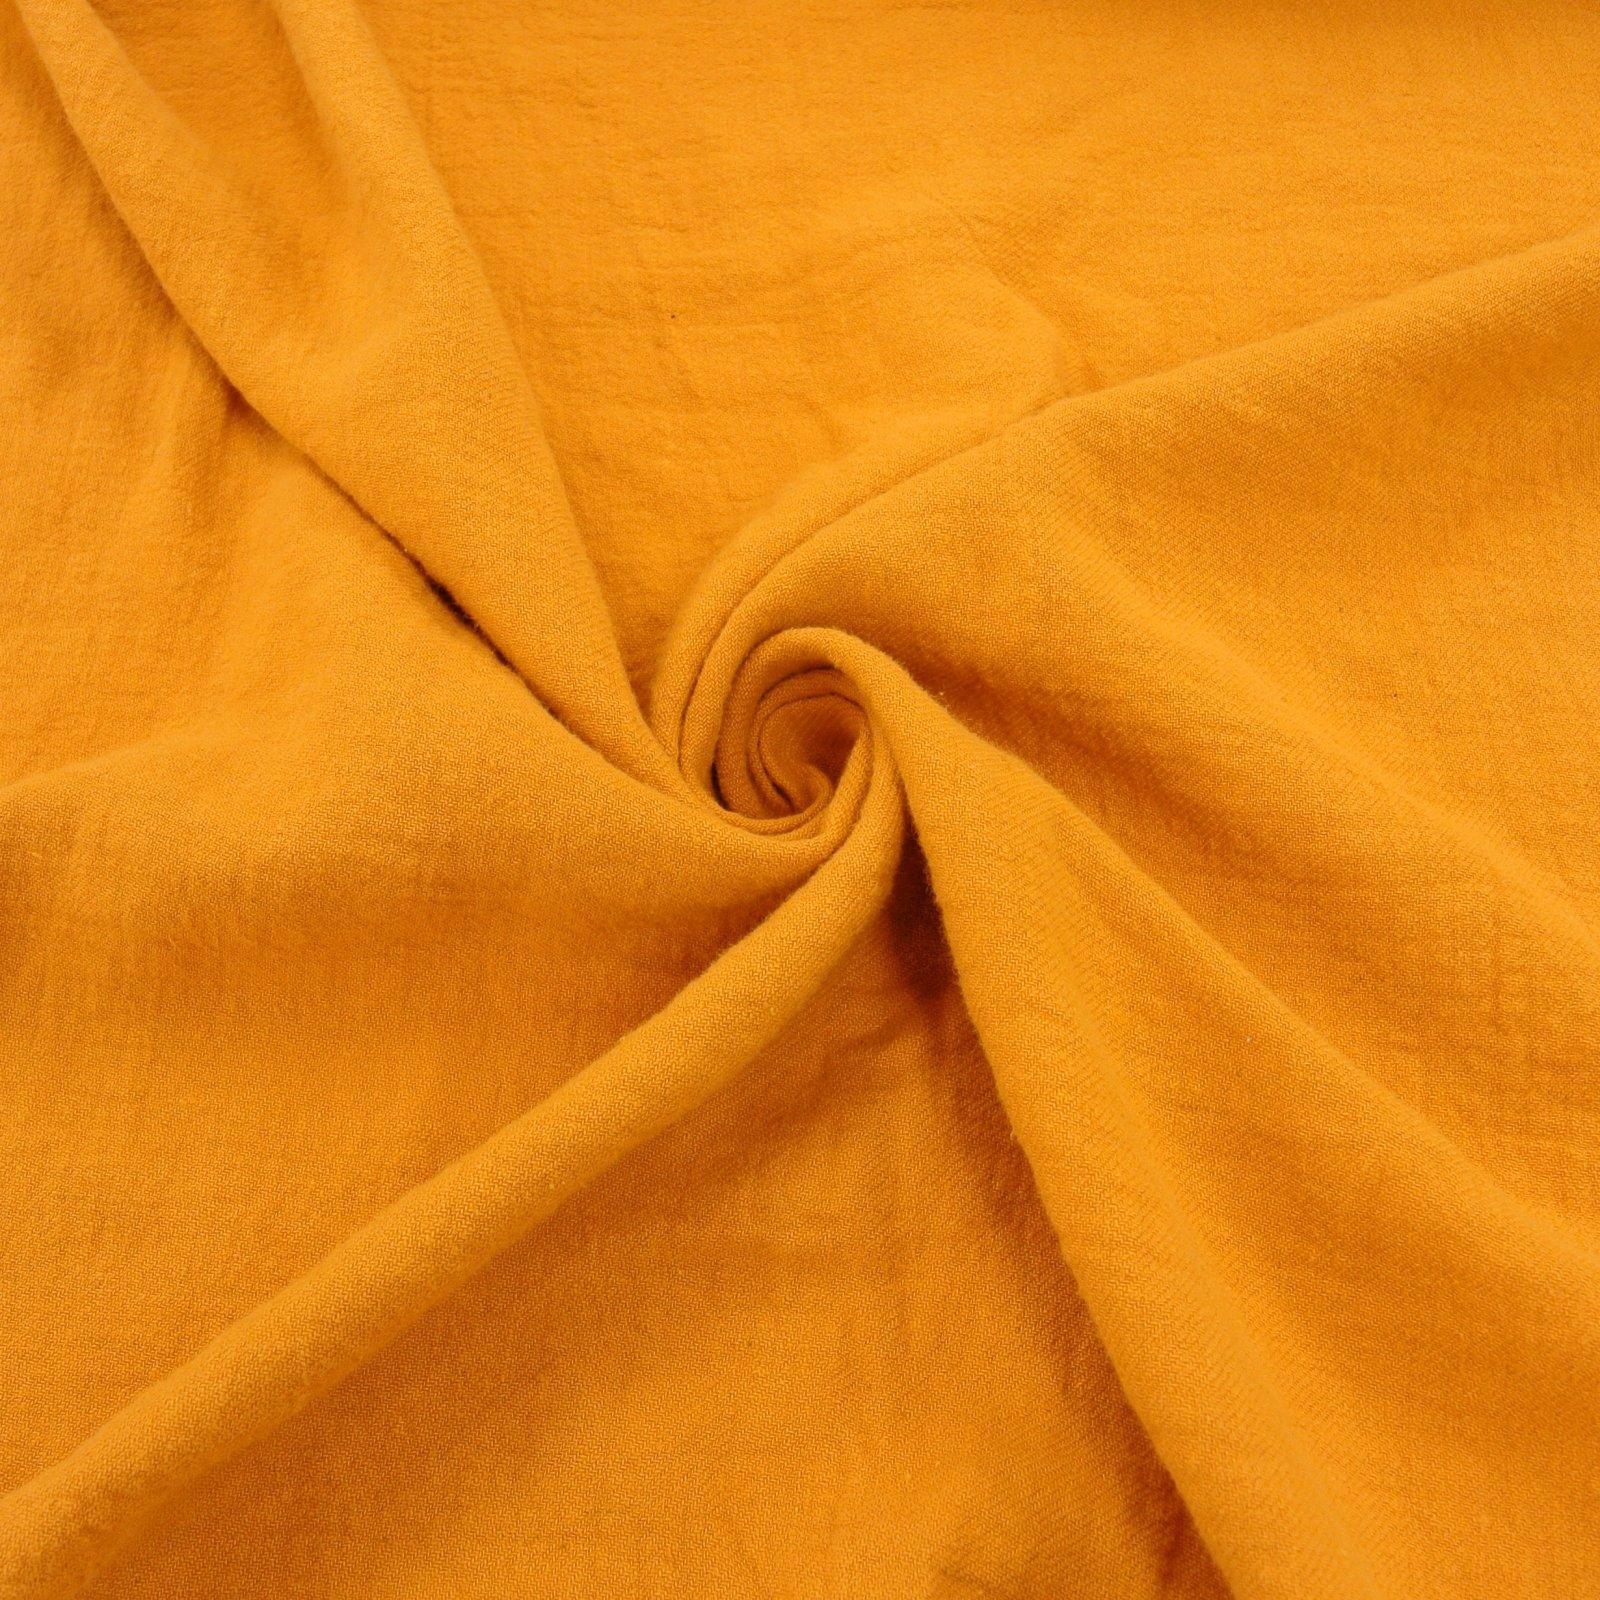 Laundered Linen squash